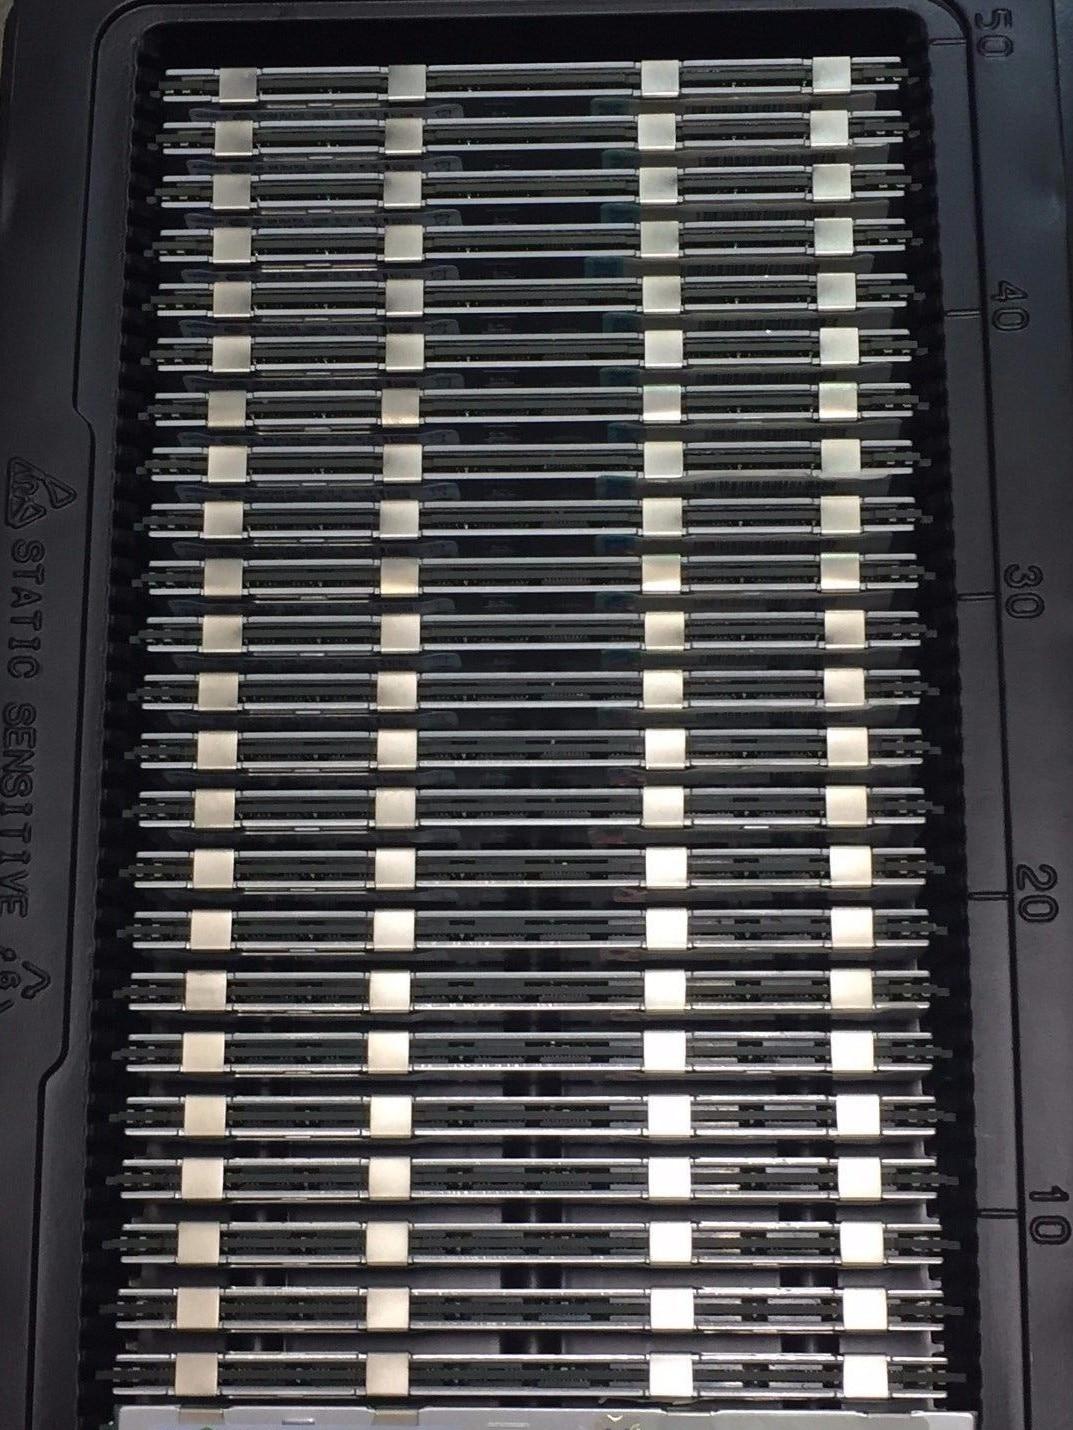 00D5048 46W0670 00D5047 16G DDR3 1866 ECC REG 1 year warranty-in Signal Boosters from Cellphones & Telecommunications    1